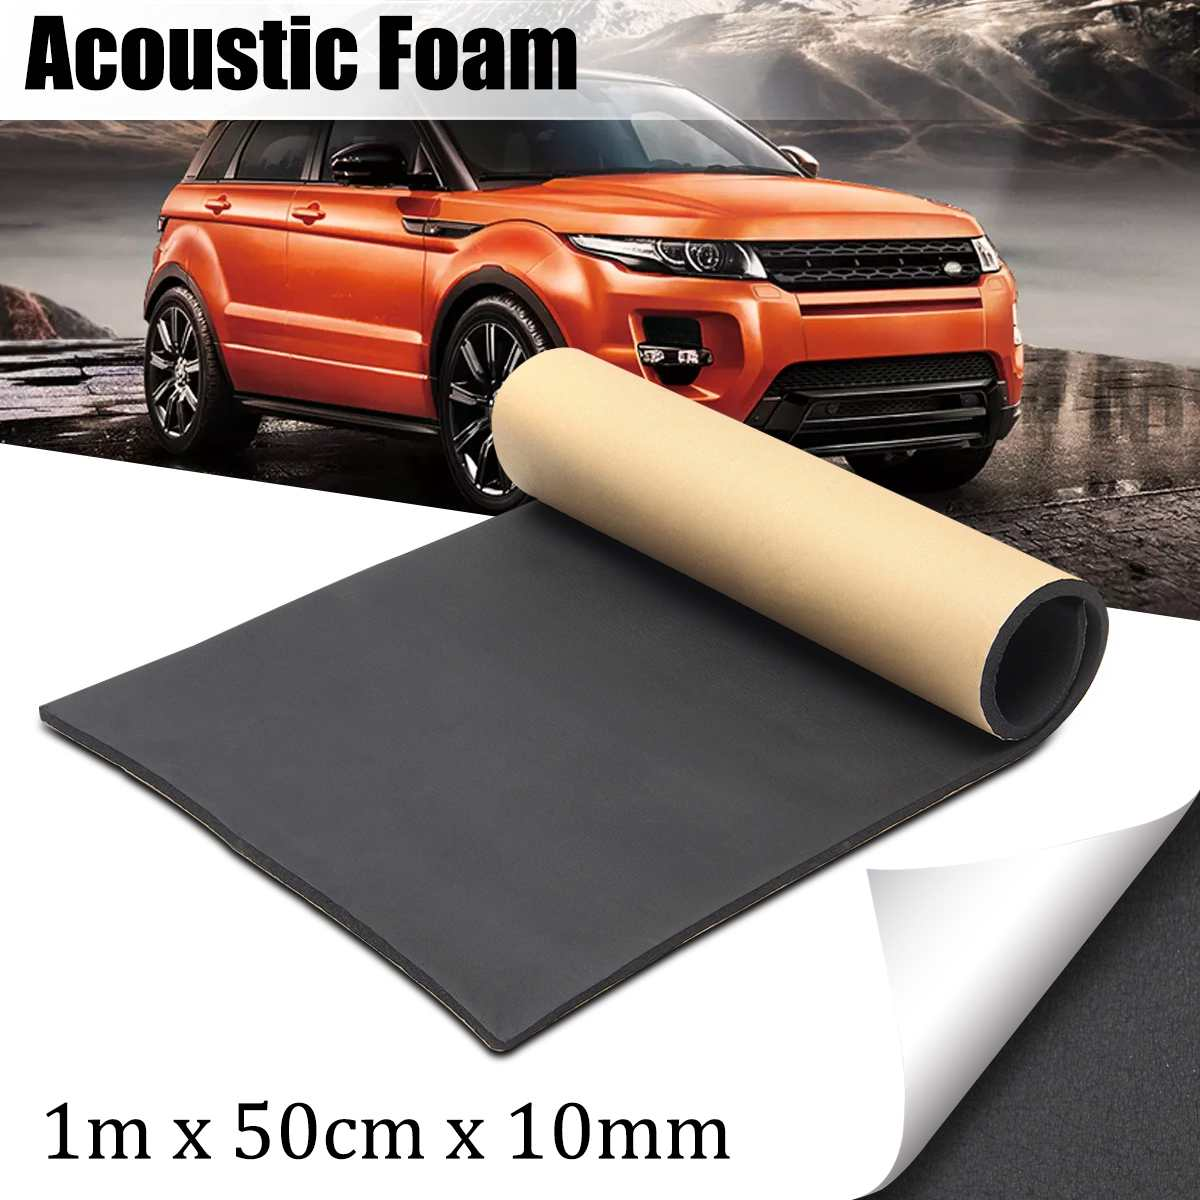 Car Van Sound Proofing Insulation Deadening Closed Cell Foam 30*50cm Auto Interior exterior Accessories 1m x 50cm x 10mm 10mm|Sound & Heat Insulation Cotton| |  - title=